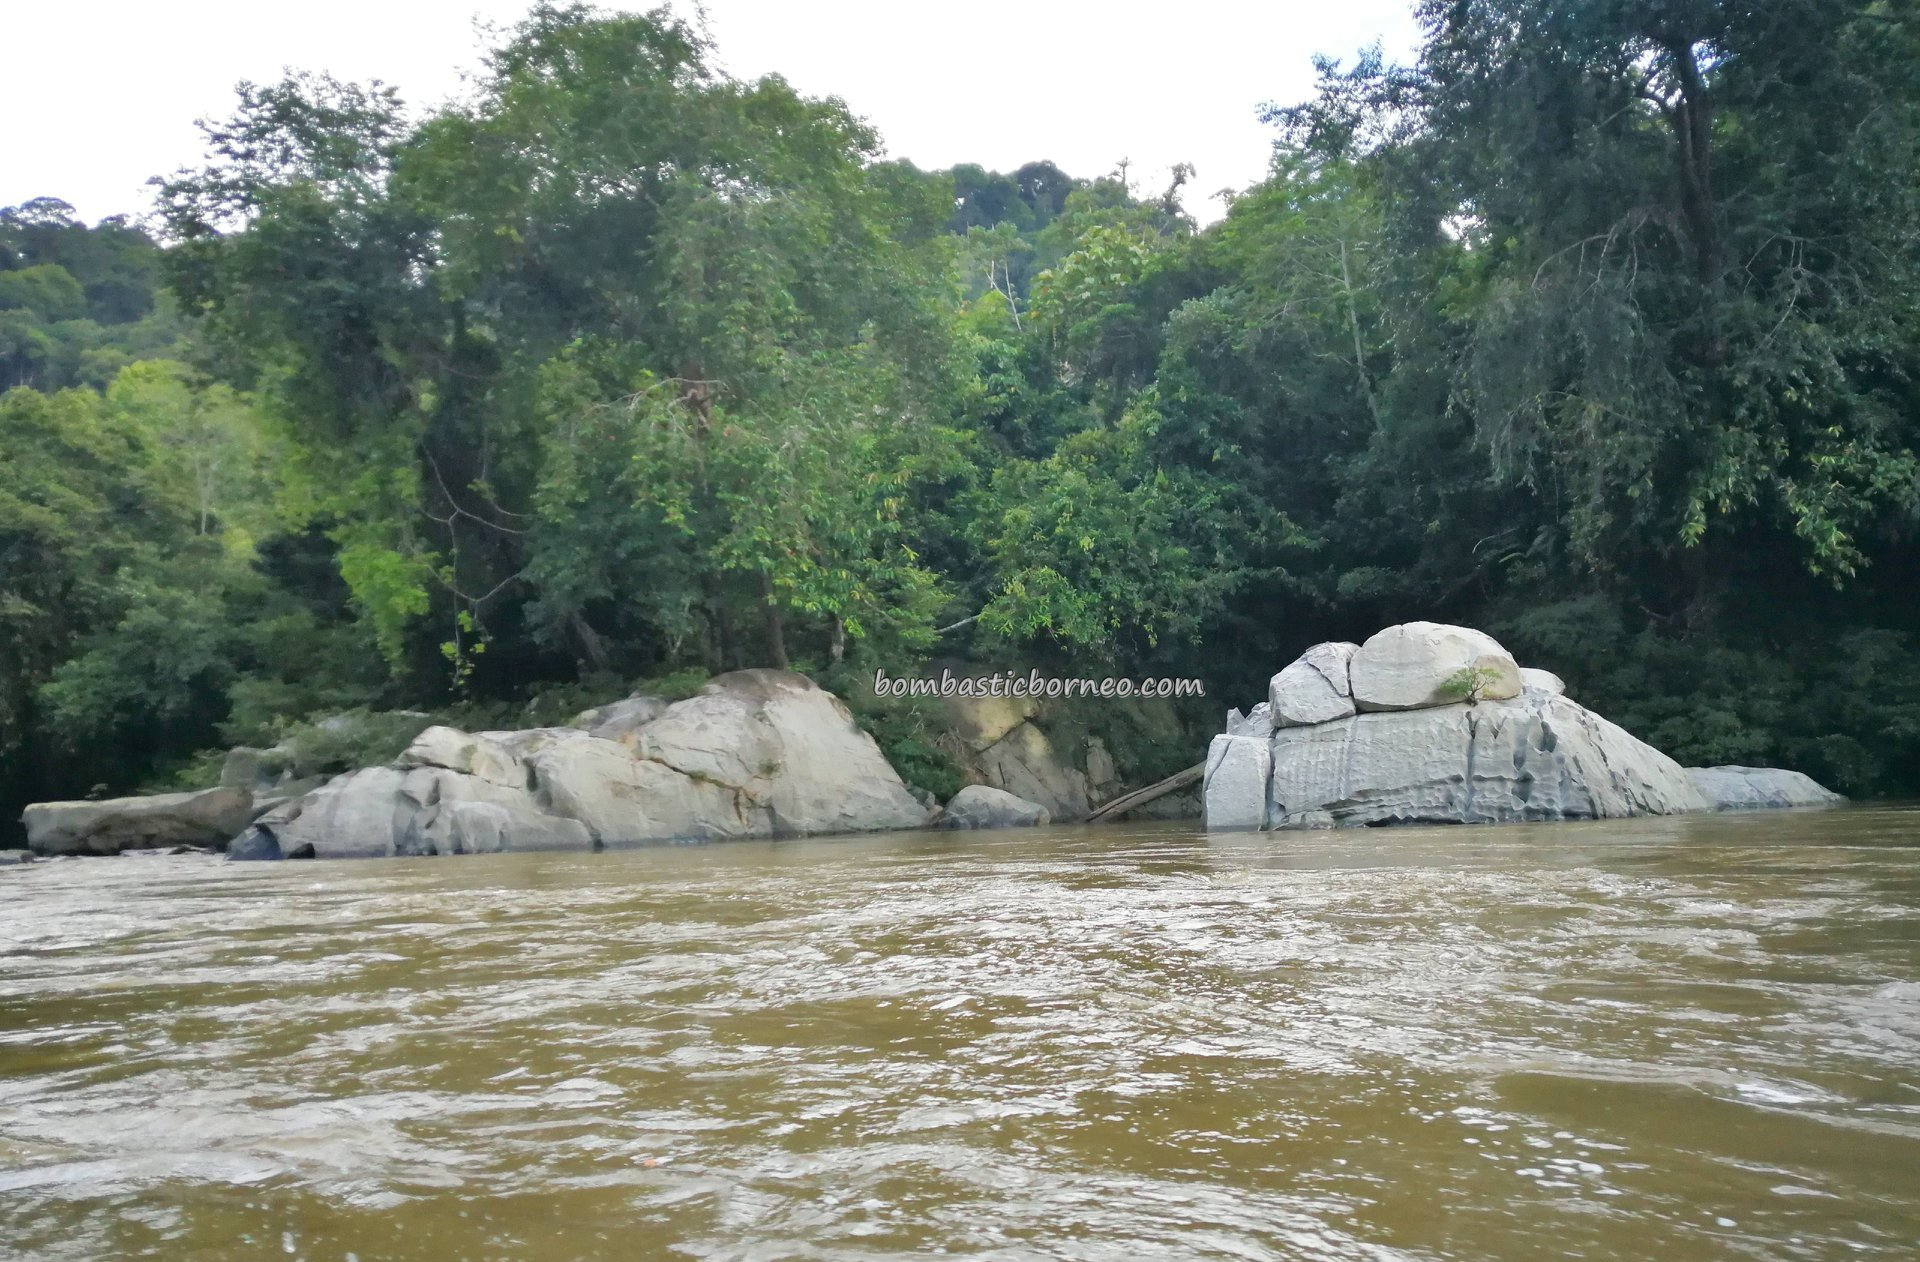 speedboat ride, Sungai, backpackers, Borneo, Desa Beringin Jaya, Indonesia, Kapuas Hulu, Putussibau Selatan, Tourism, tourist attraction, travel guide, traditional, crossborder, 印尼西加里曼丹